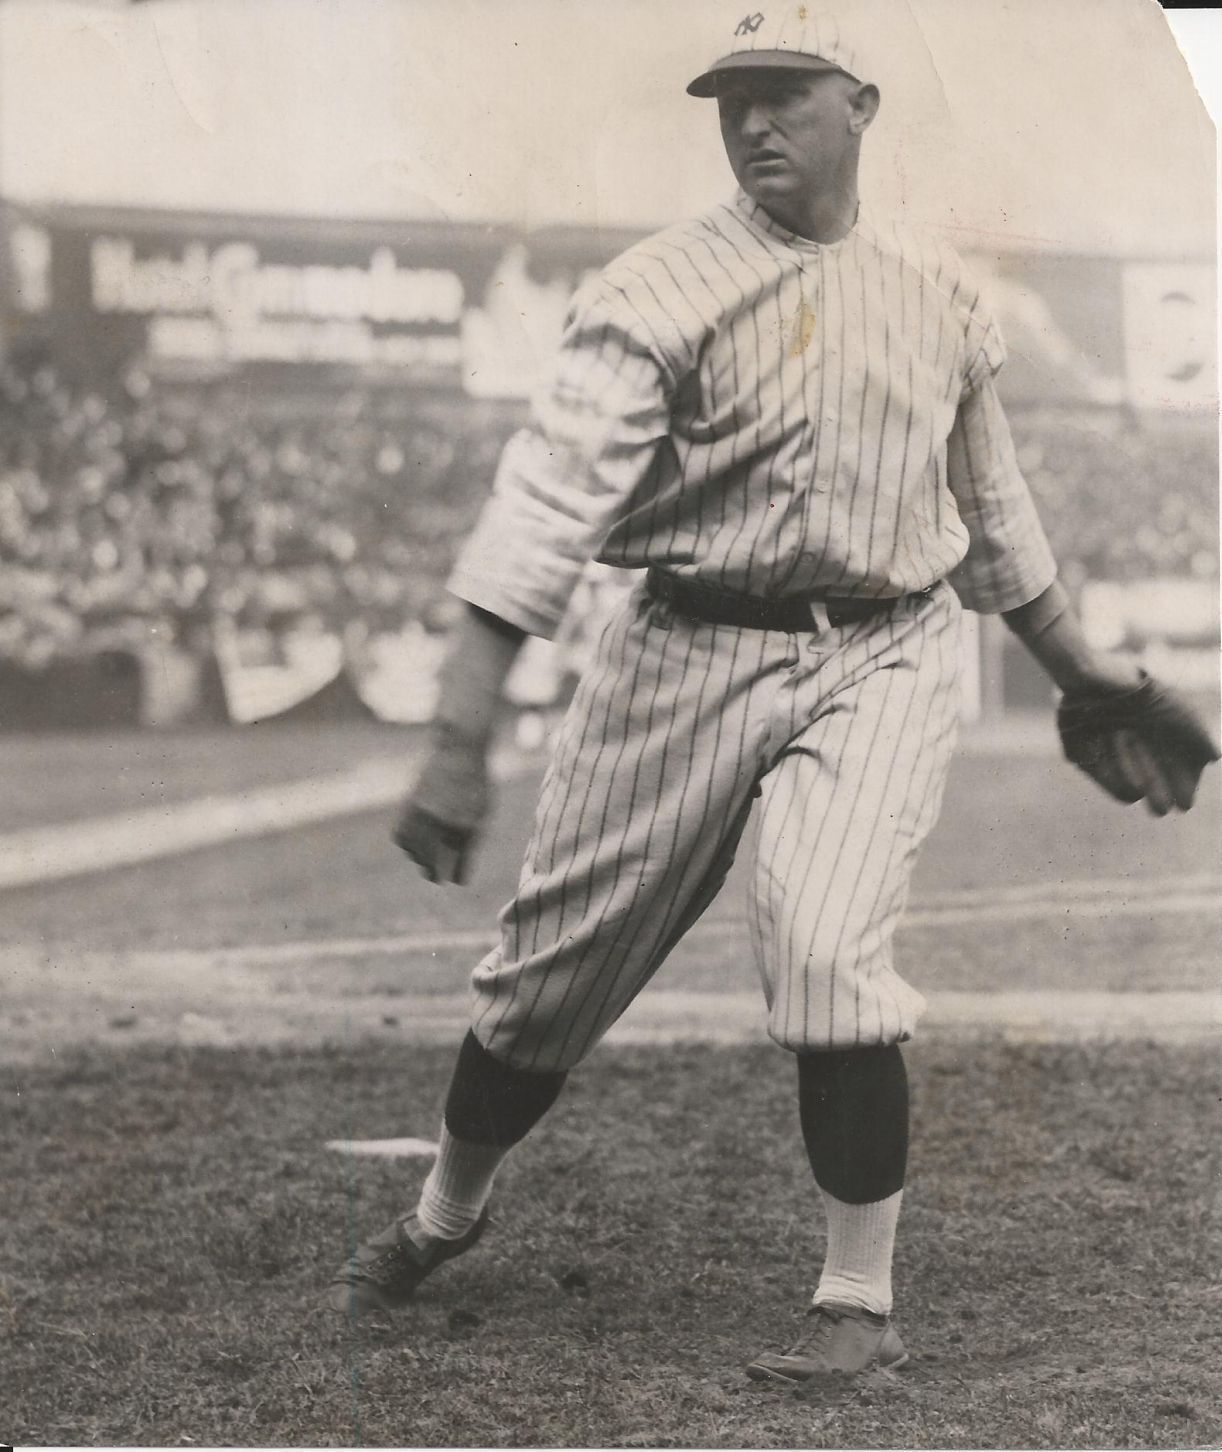 wholesale dealer 46acb 82306 Carl Mays 1920's Original Photo NY Yankees Uniform The Pitch ...